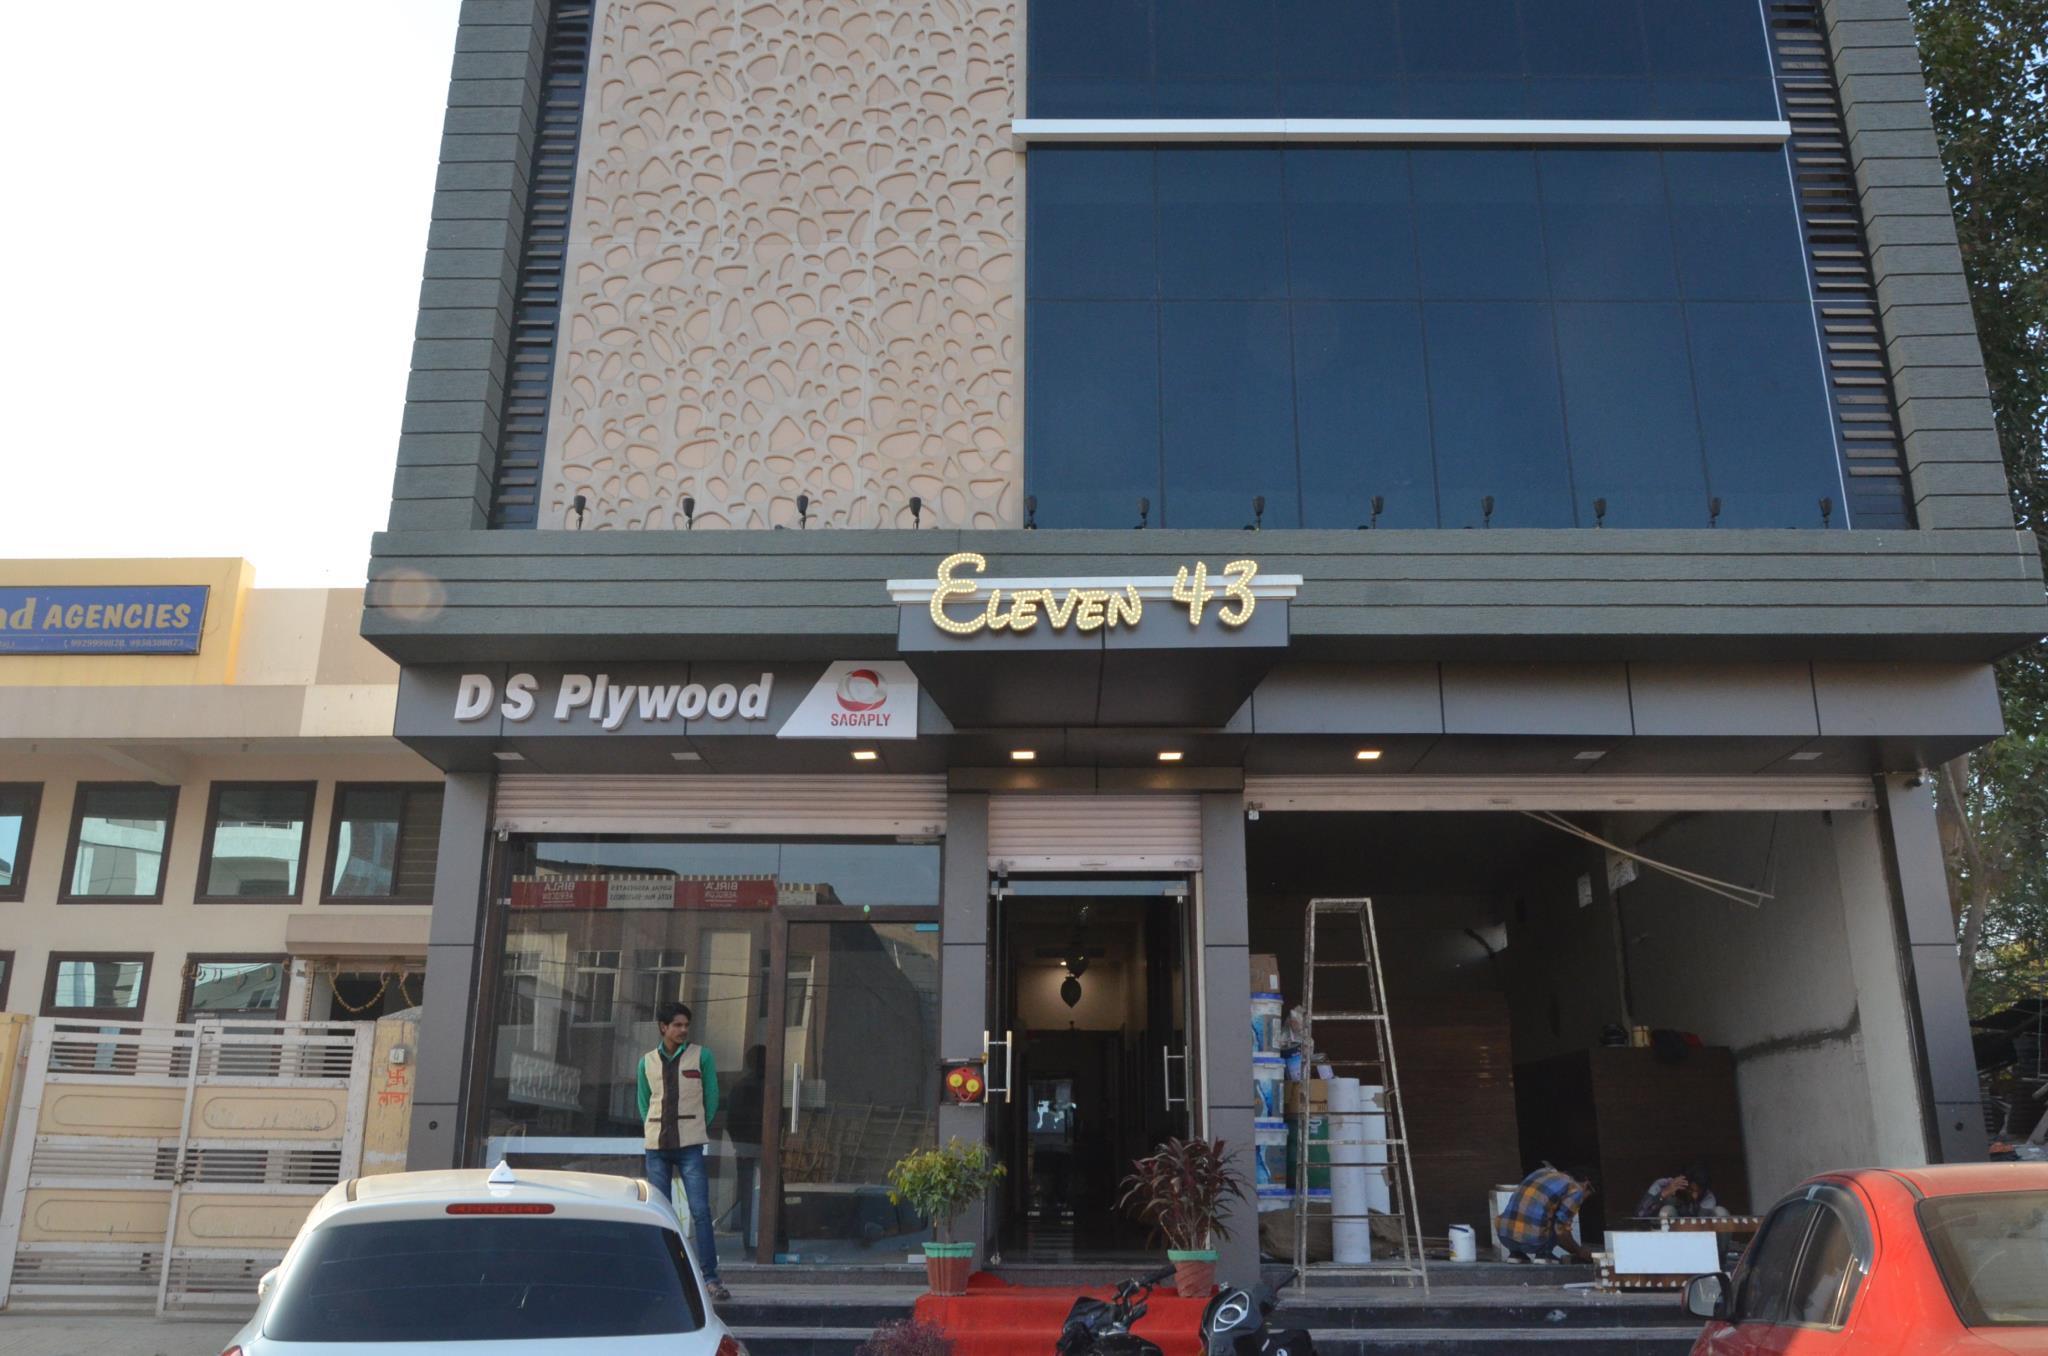 OYO 11517 Hotel Eleven 43